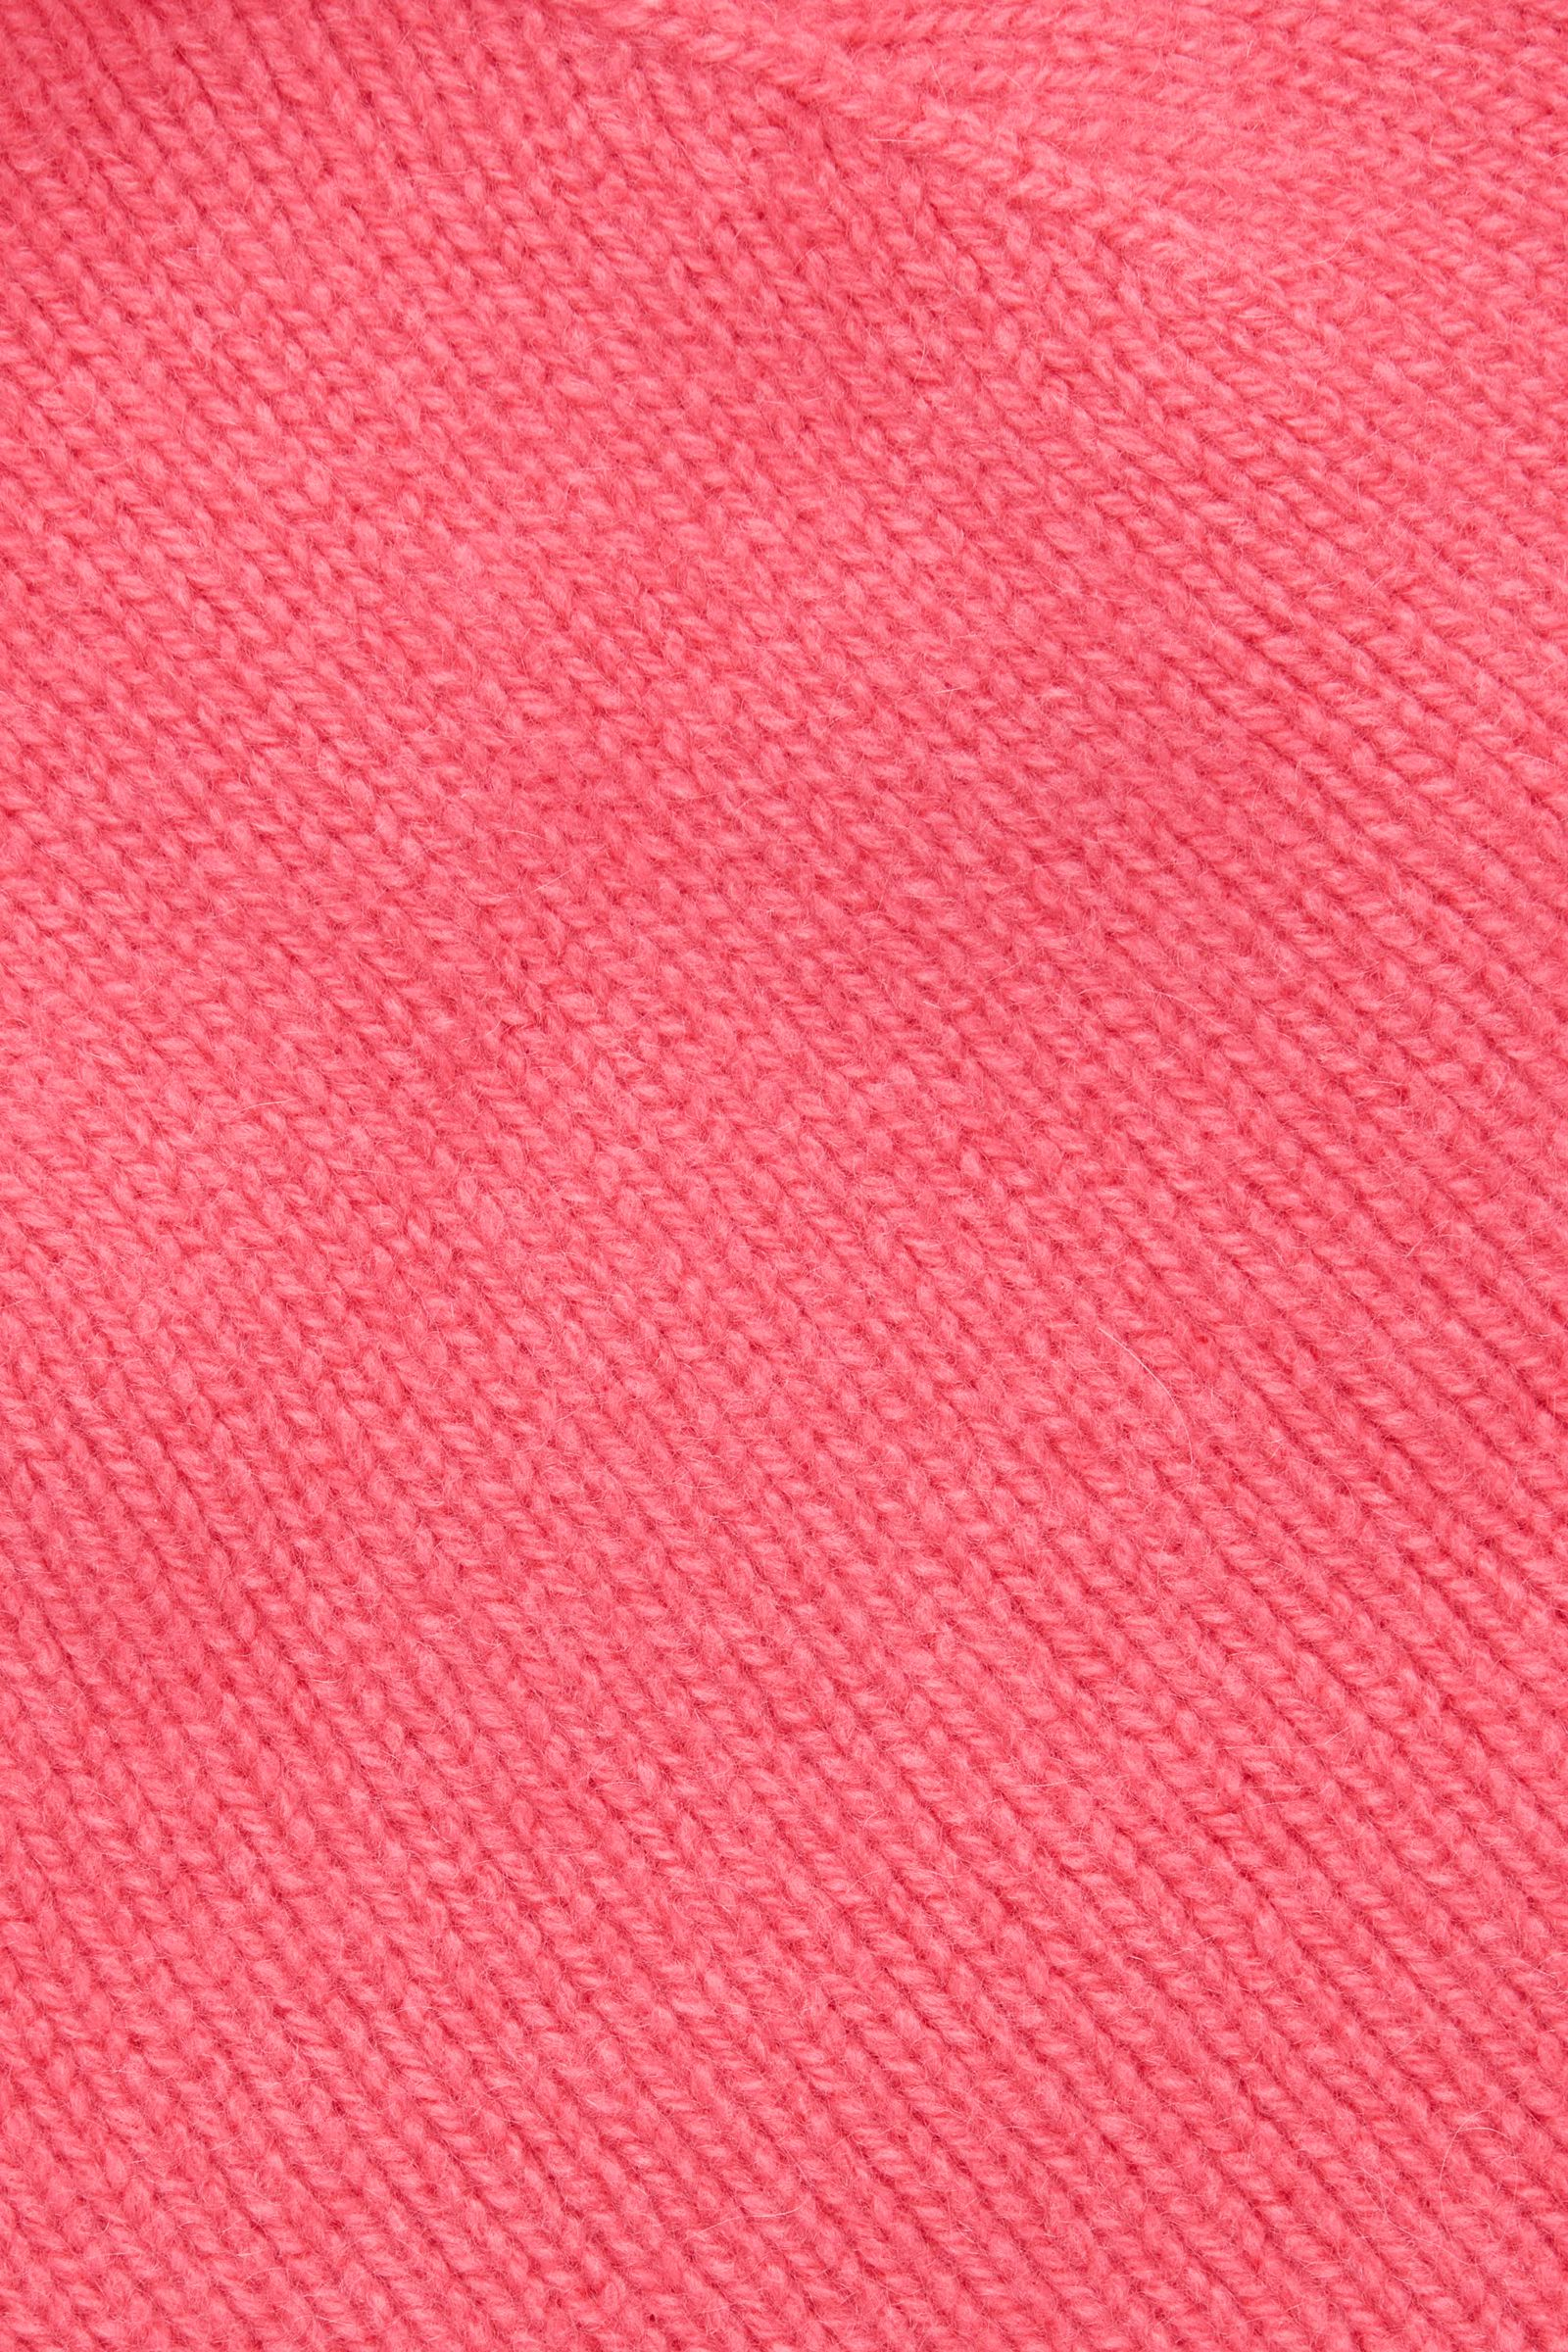 COS 캐시미어 비니의 브라이트 핑크컬러 Detail입니다.